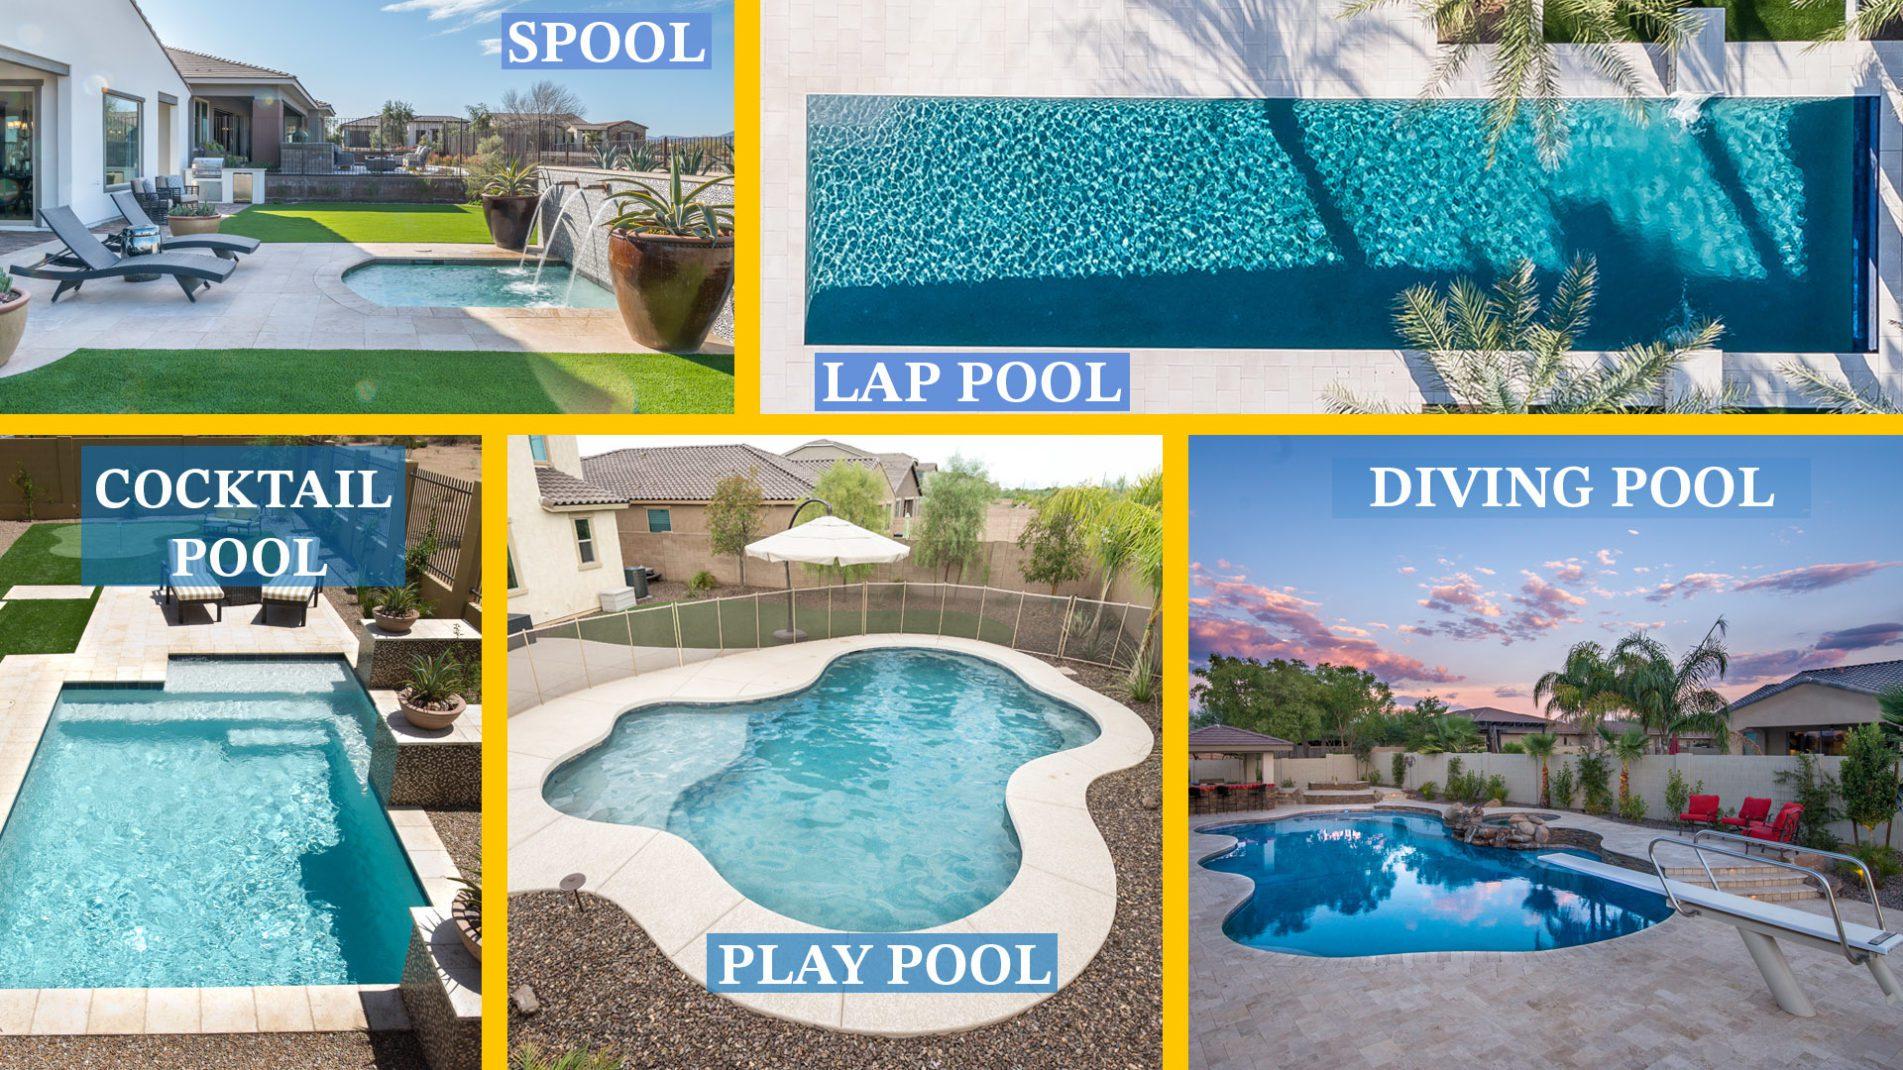 Spool vs Lap Pool vs Cocktail Pool vs Play Pool vs Diving Pool